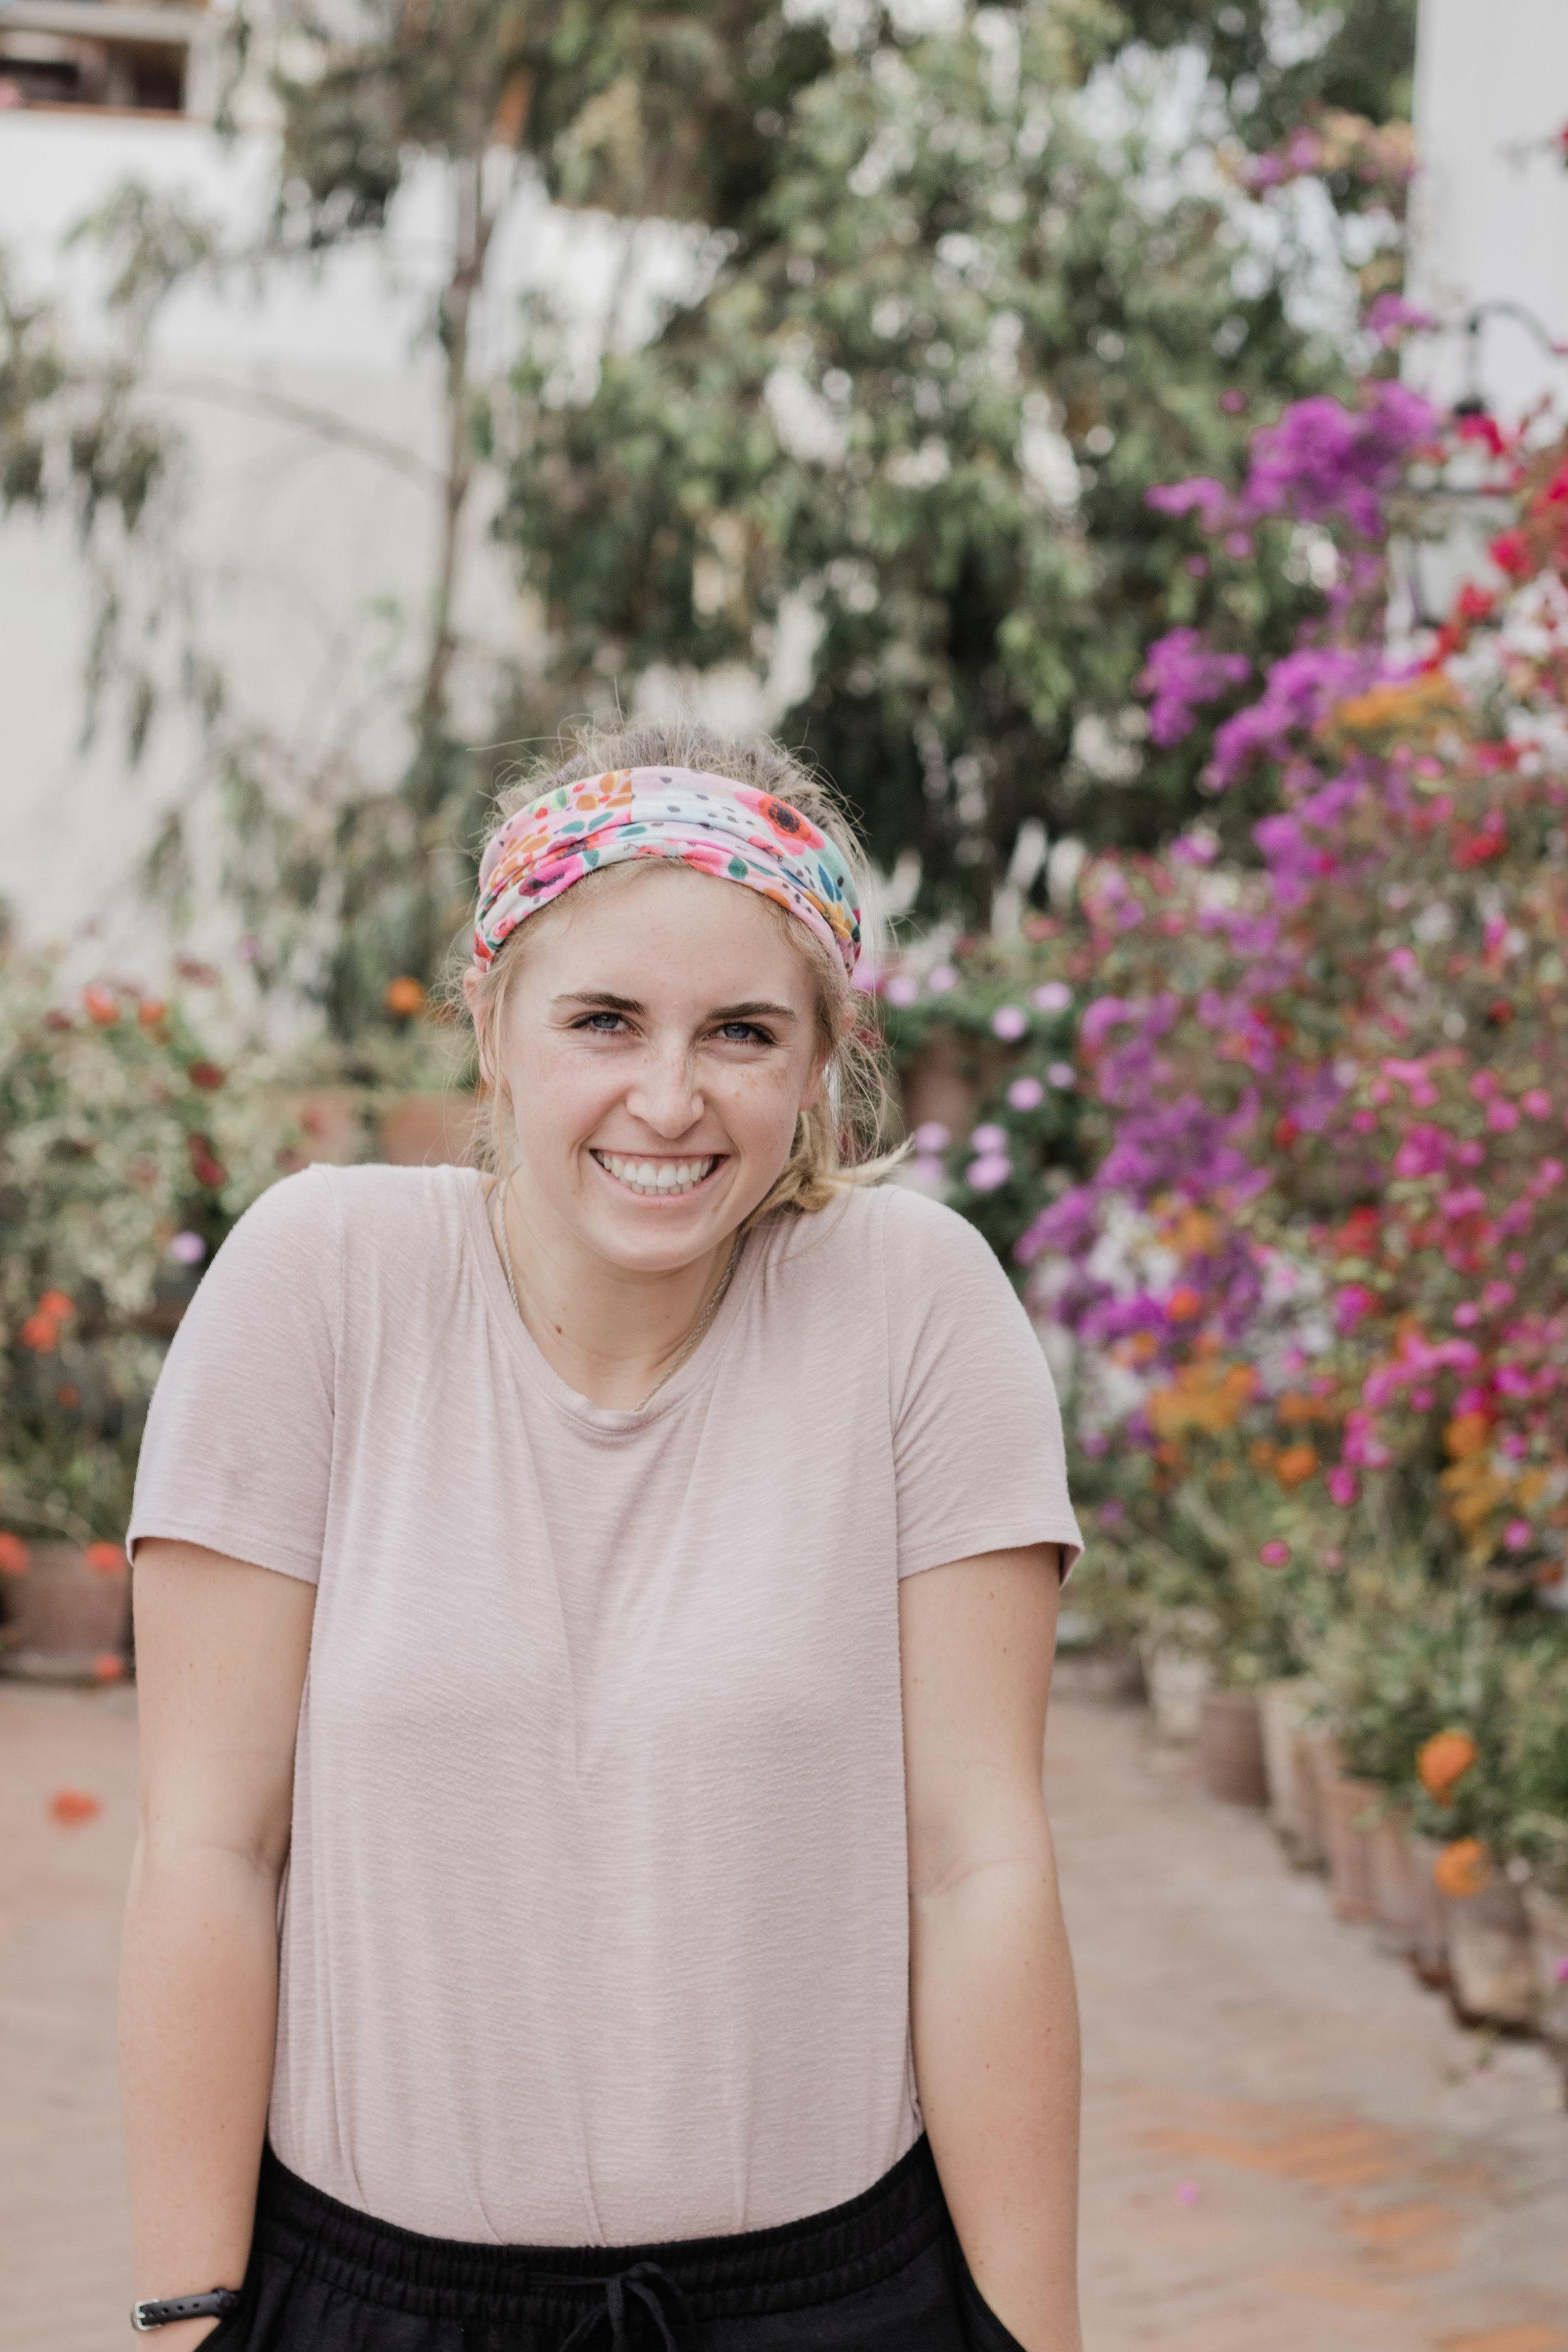 Samantha Ponder - Sponsor Engagement Coordinator, US Office -  Bio